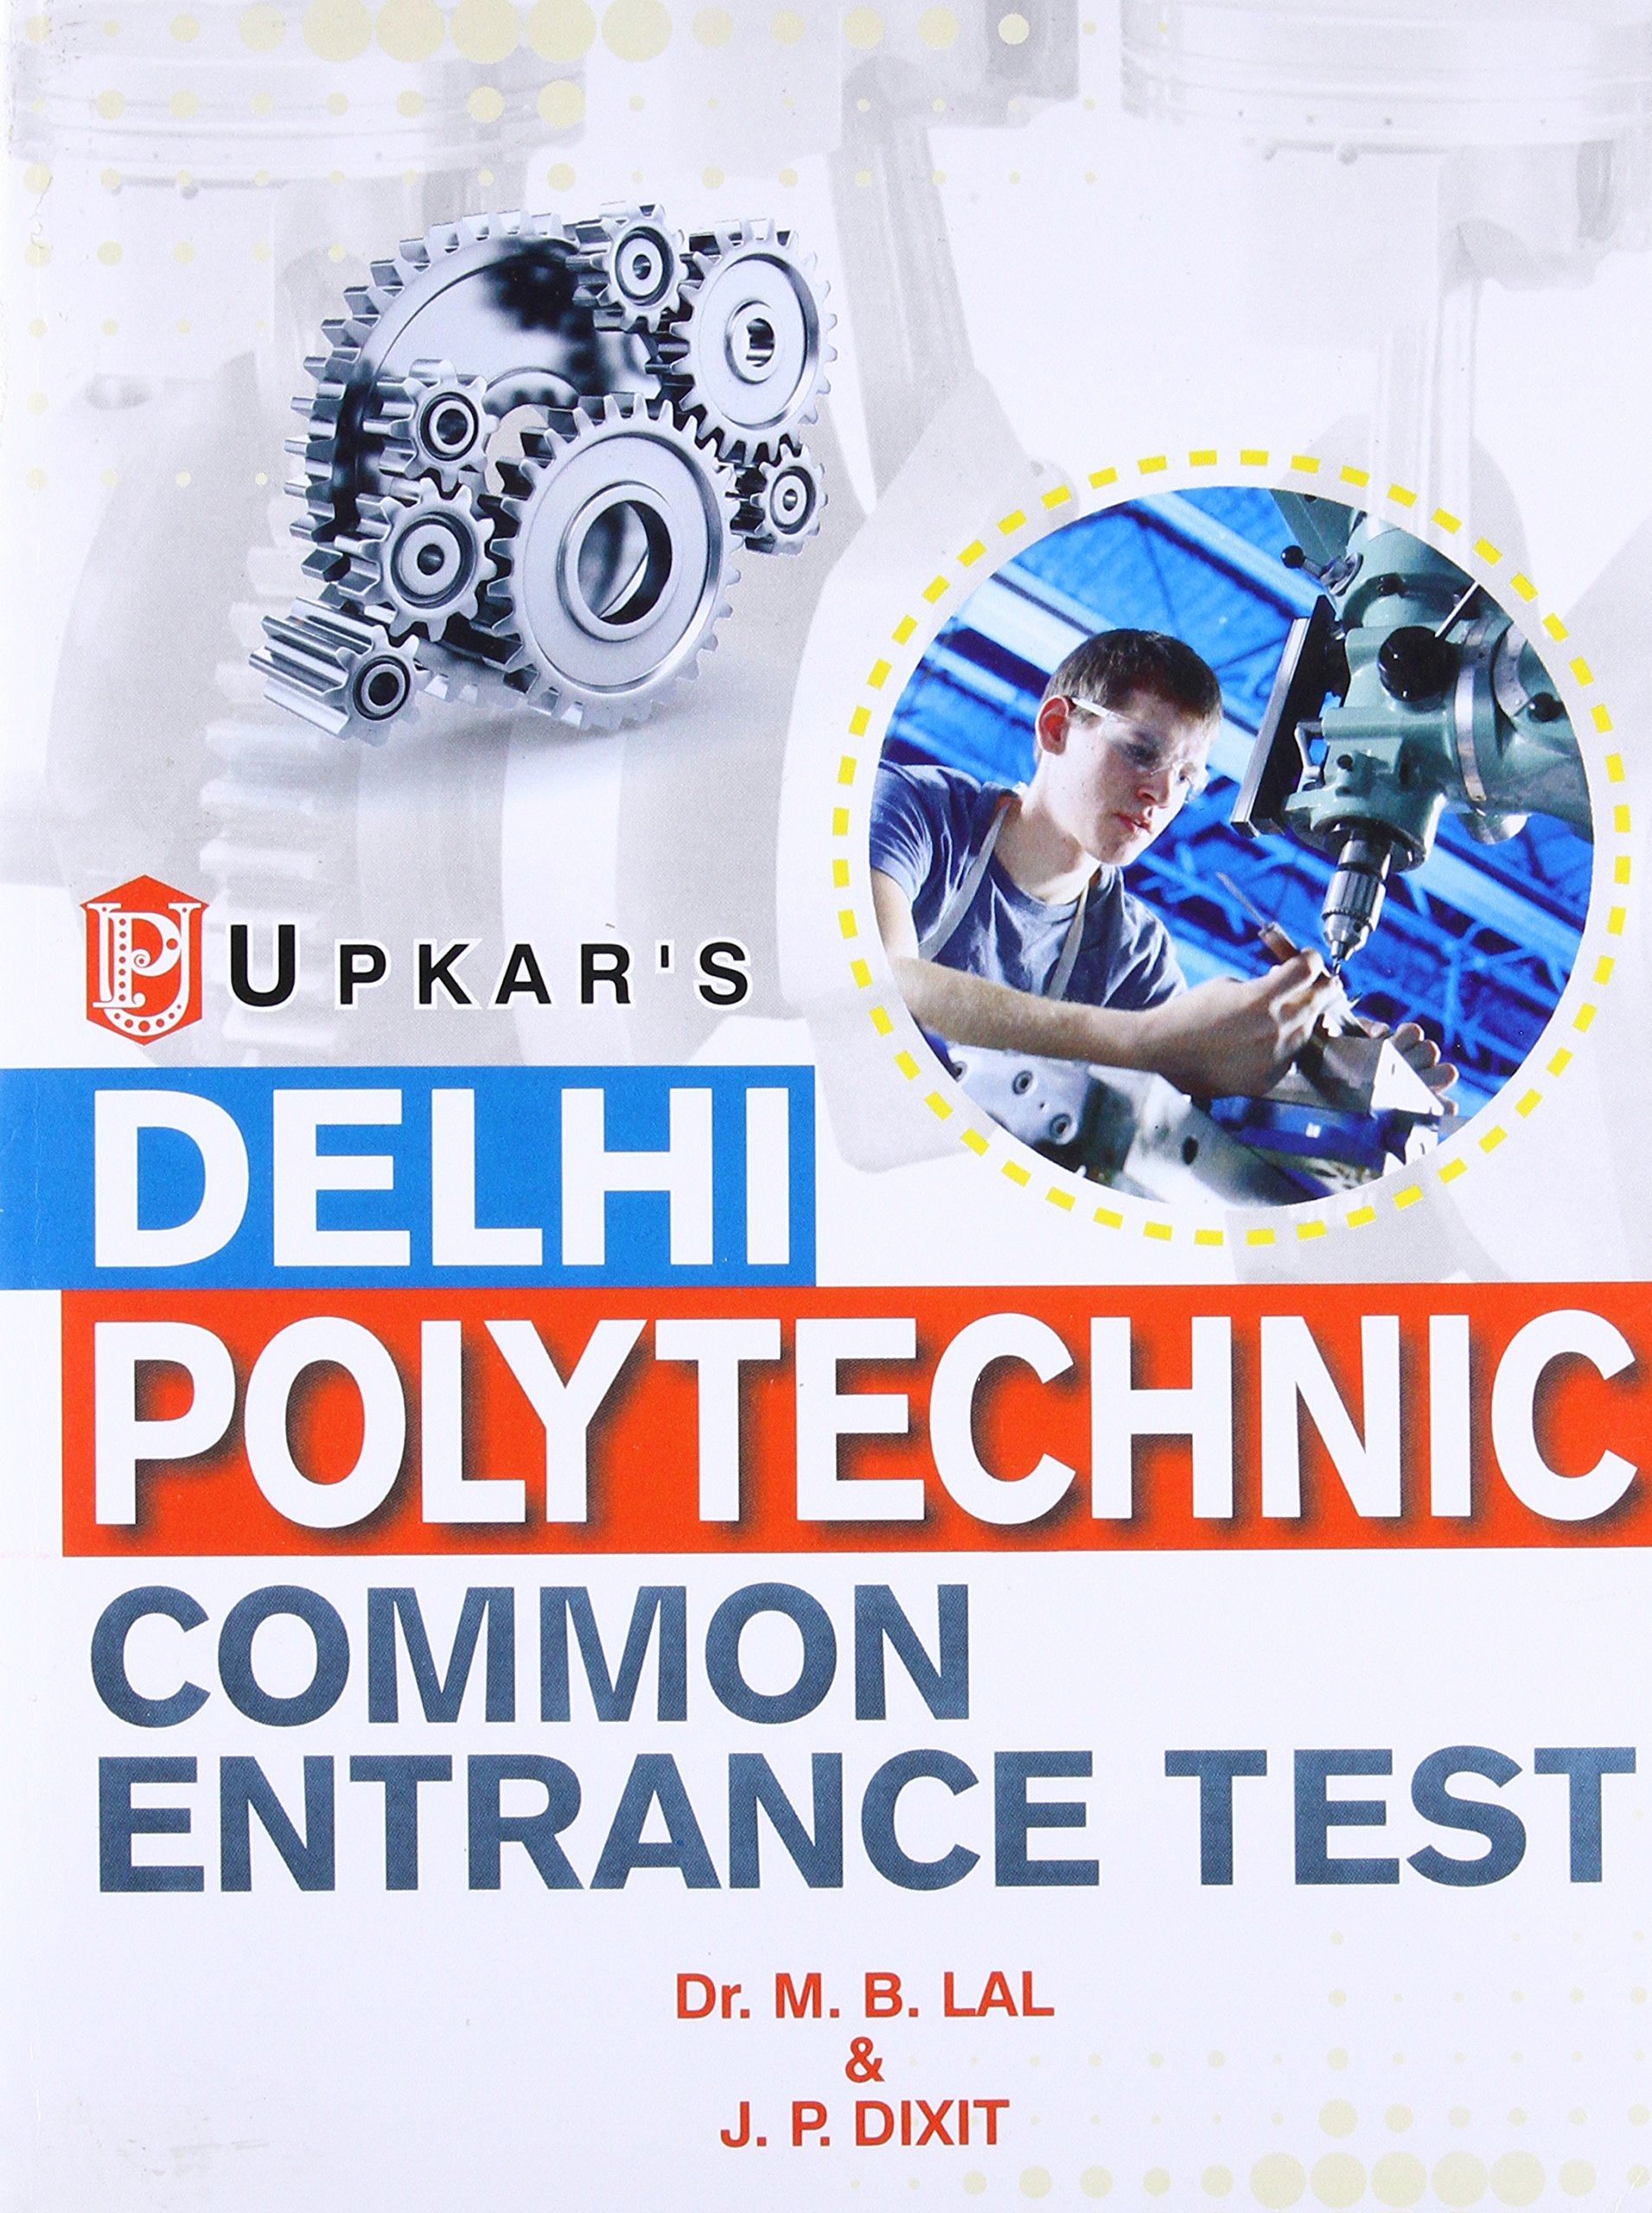 Delhi Polytechnics Common Entrance Test - 10th Based Diploma Courses Paperback Jan 01, 2010 J.P. Dixit, Dr.M.B. Lal: Amazon.es: Libros